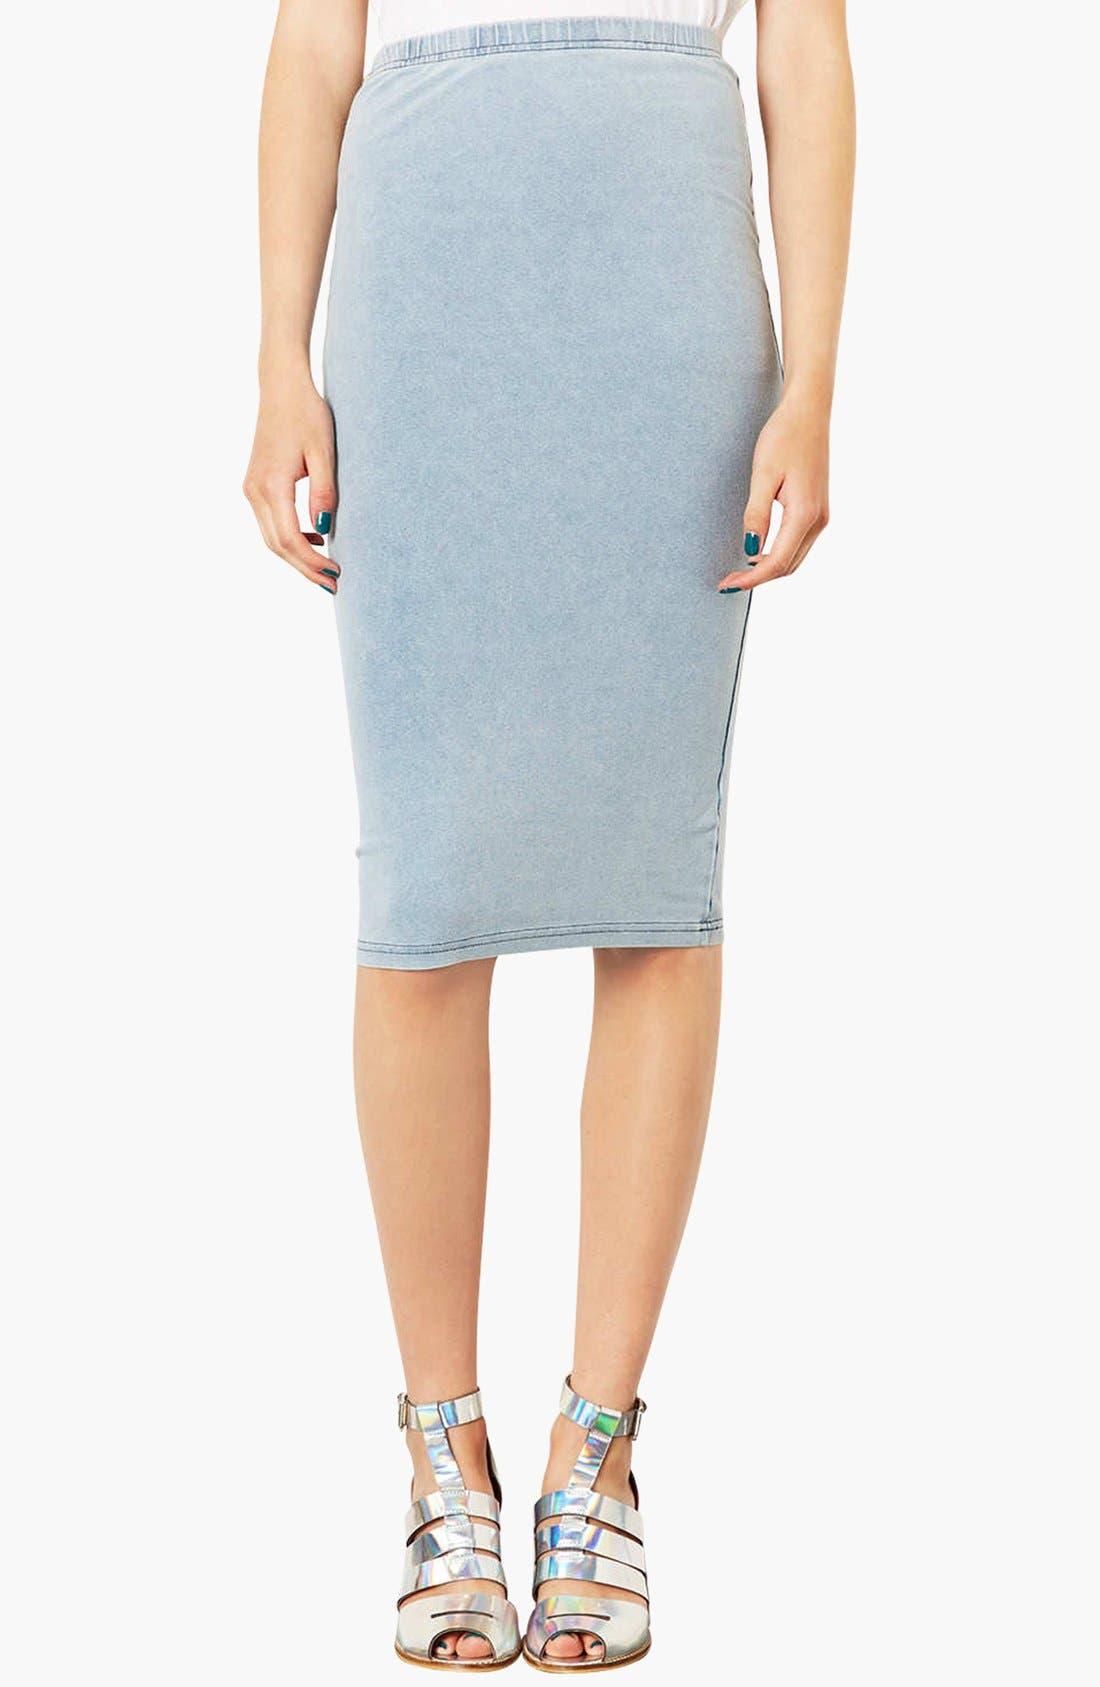 Alternate Image 1 Selected - Topshop 'Denim Look' Tube Skirt